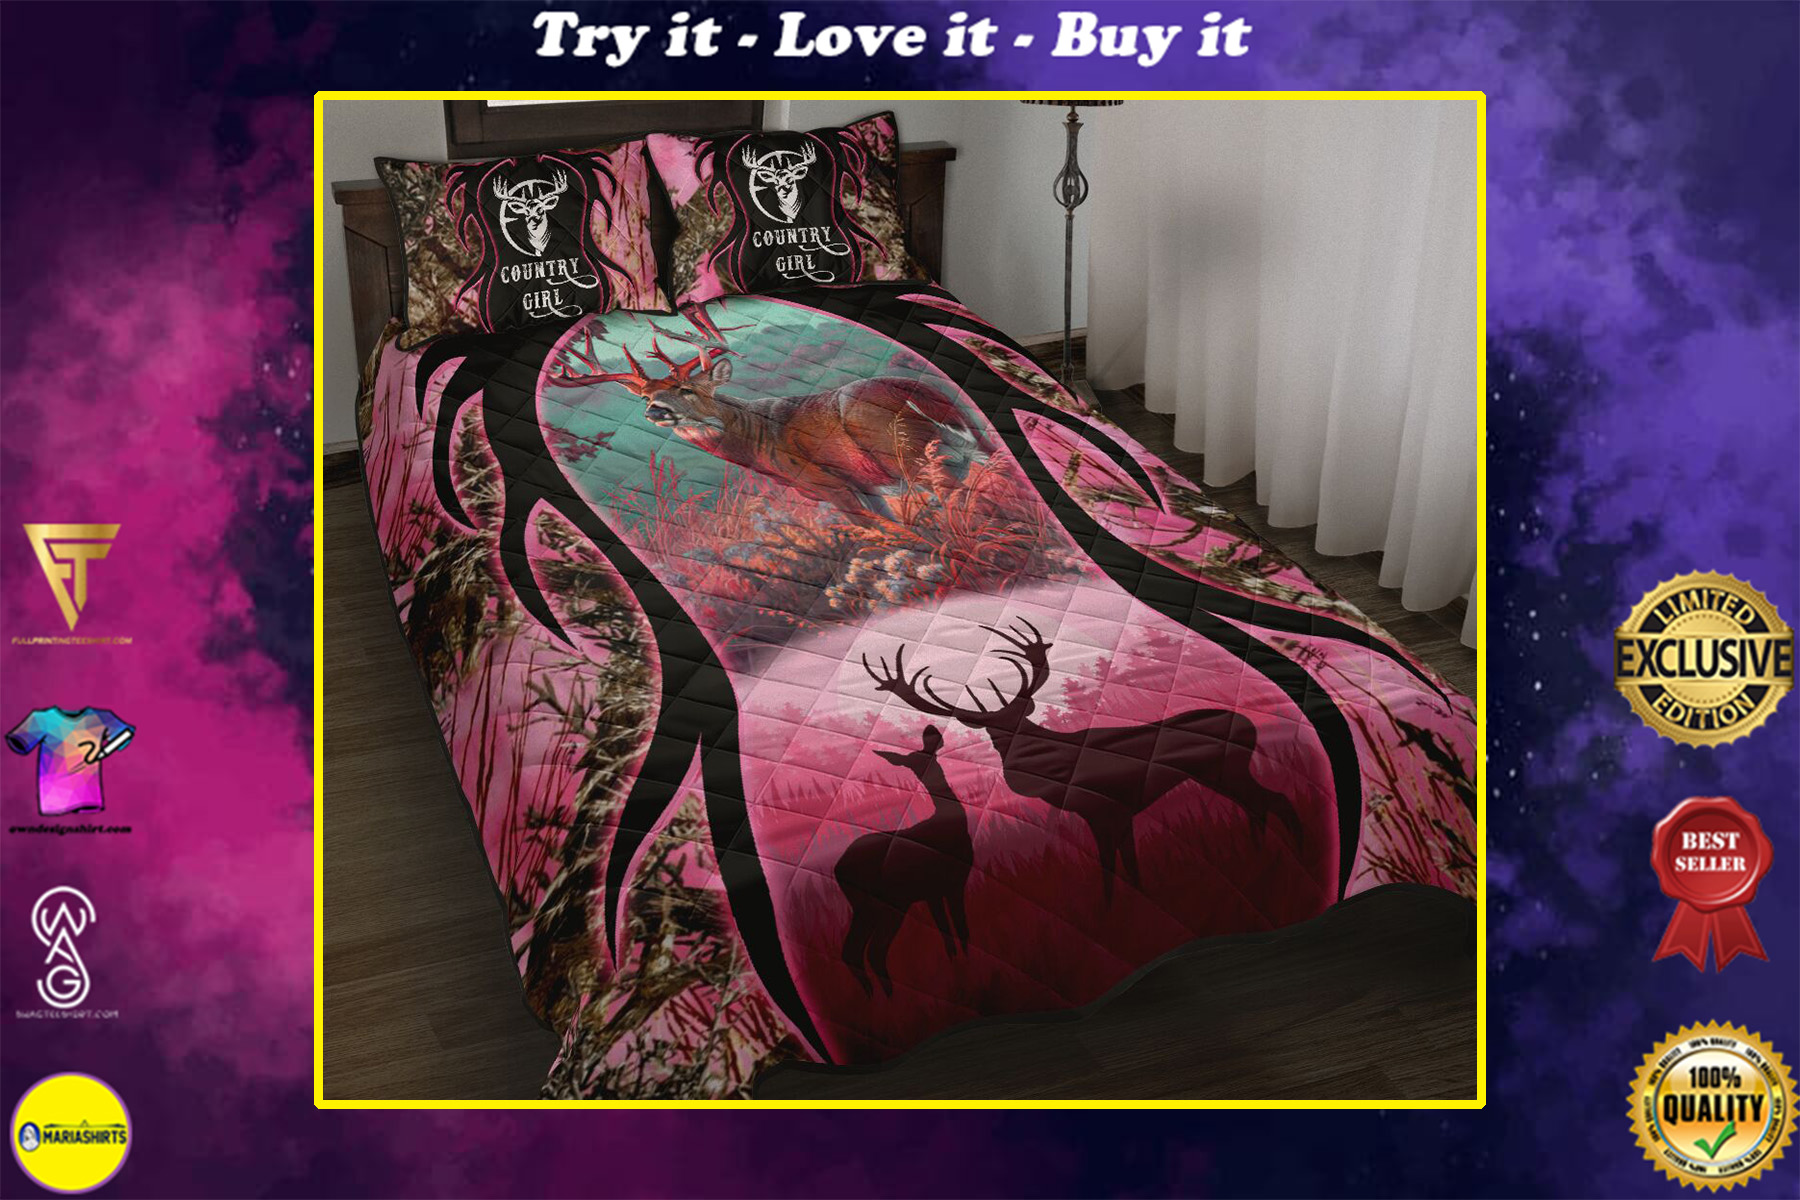 deer hunter love hunting country girl full printing bedding set